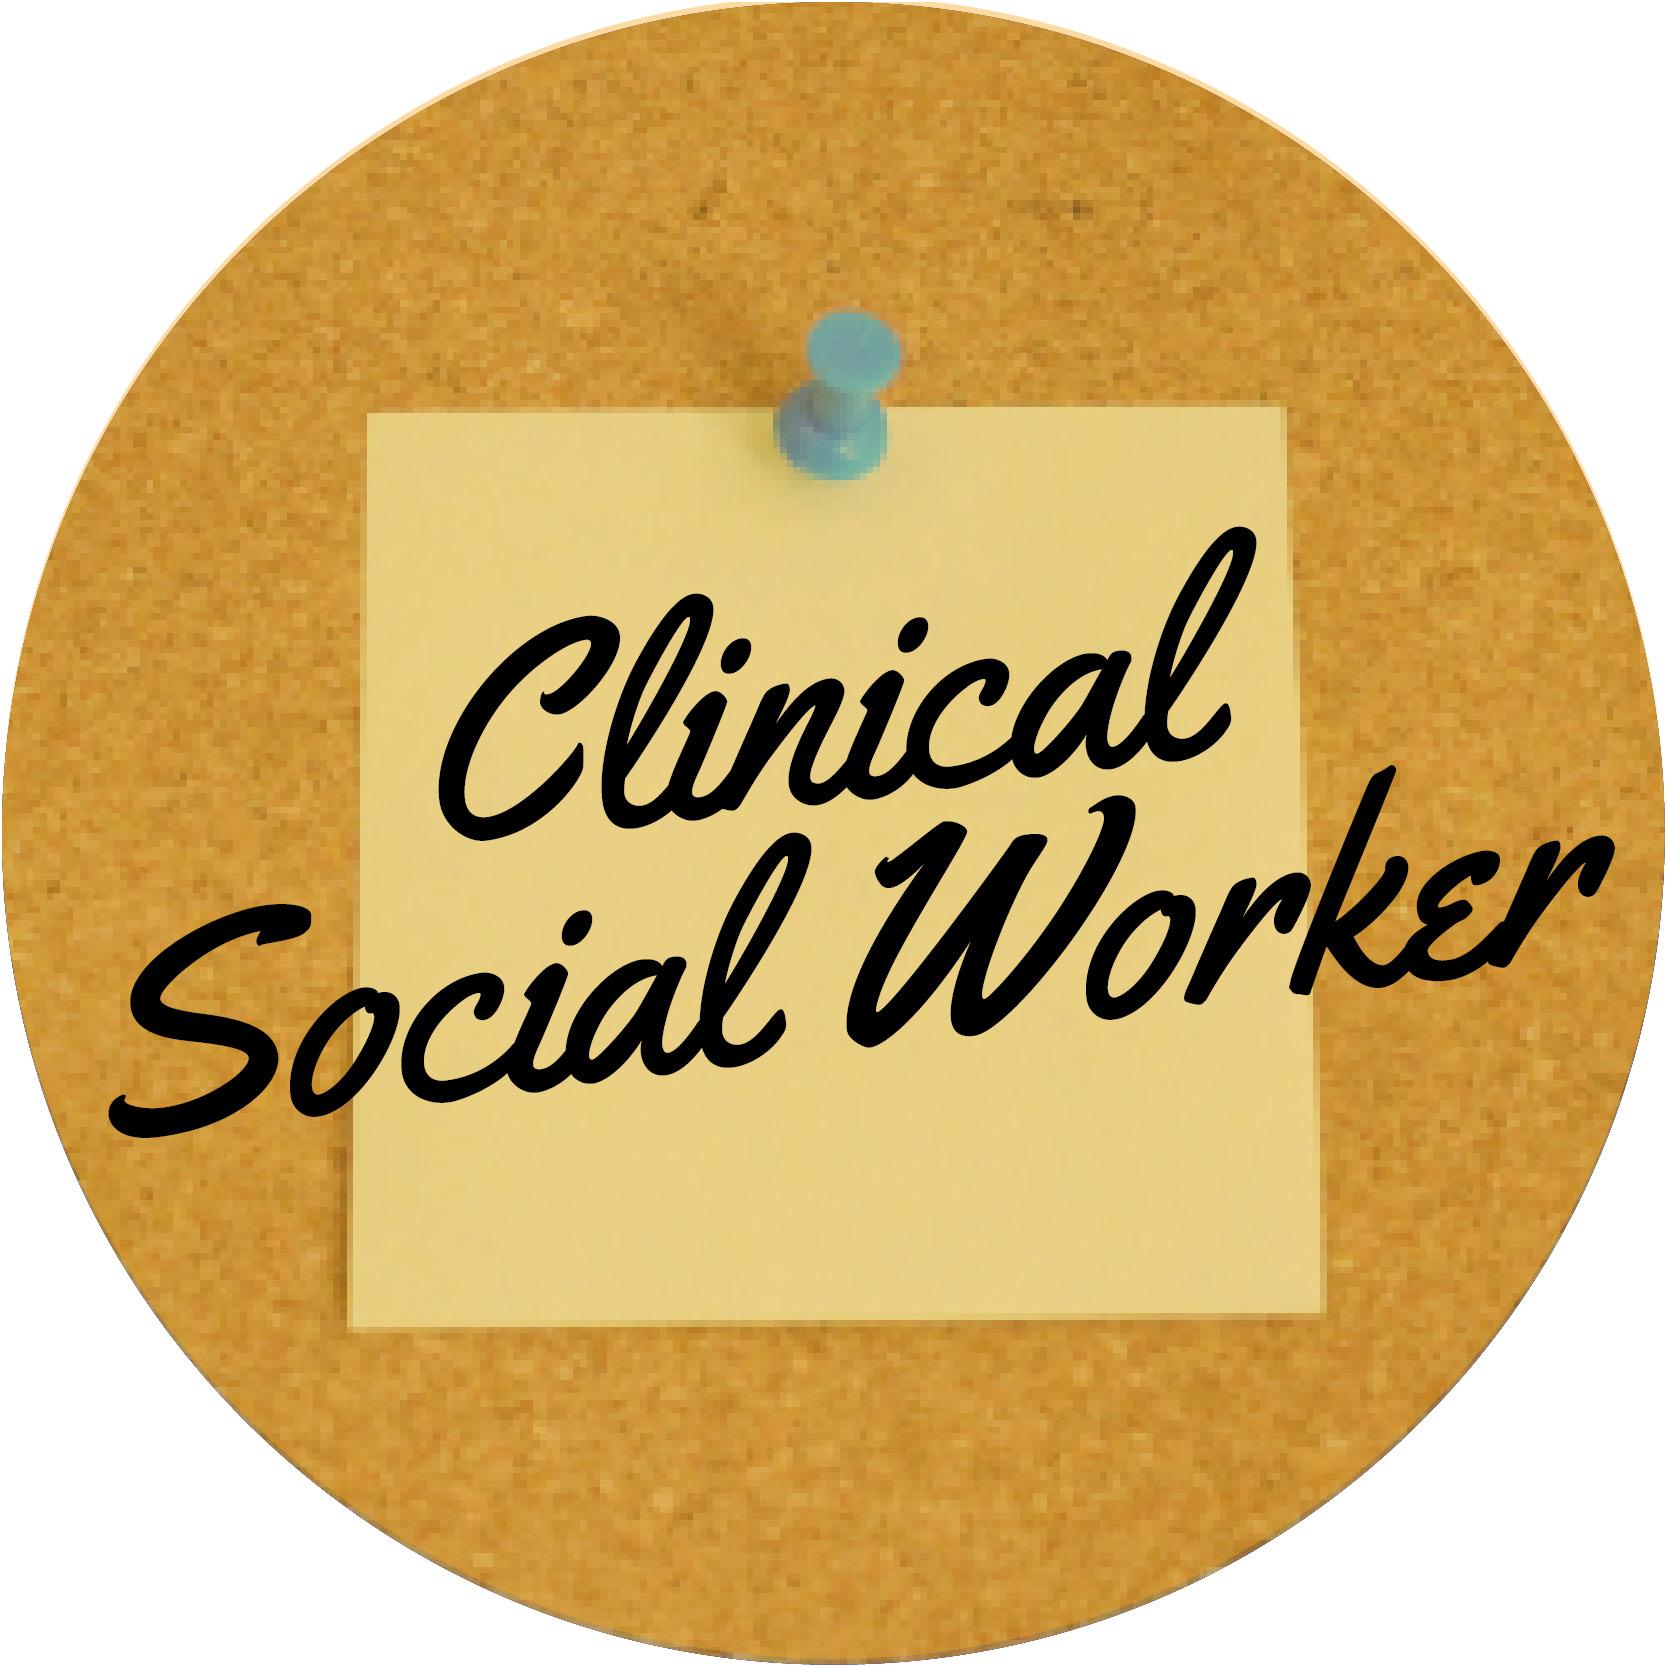 clinicalsocialworker2017.jpg